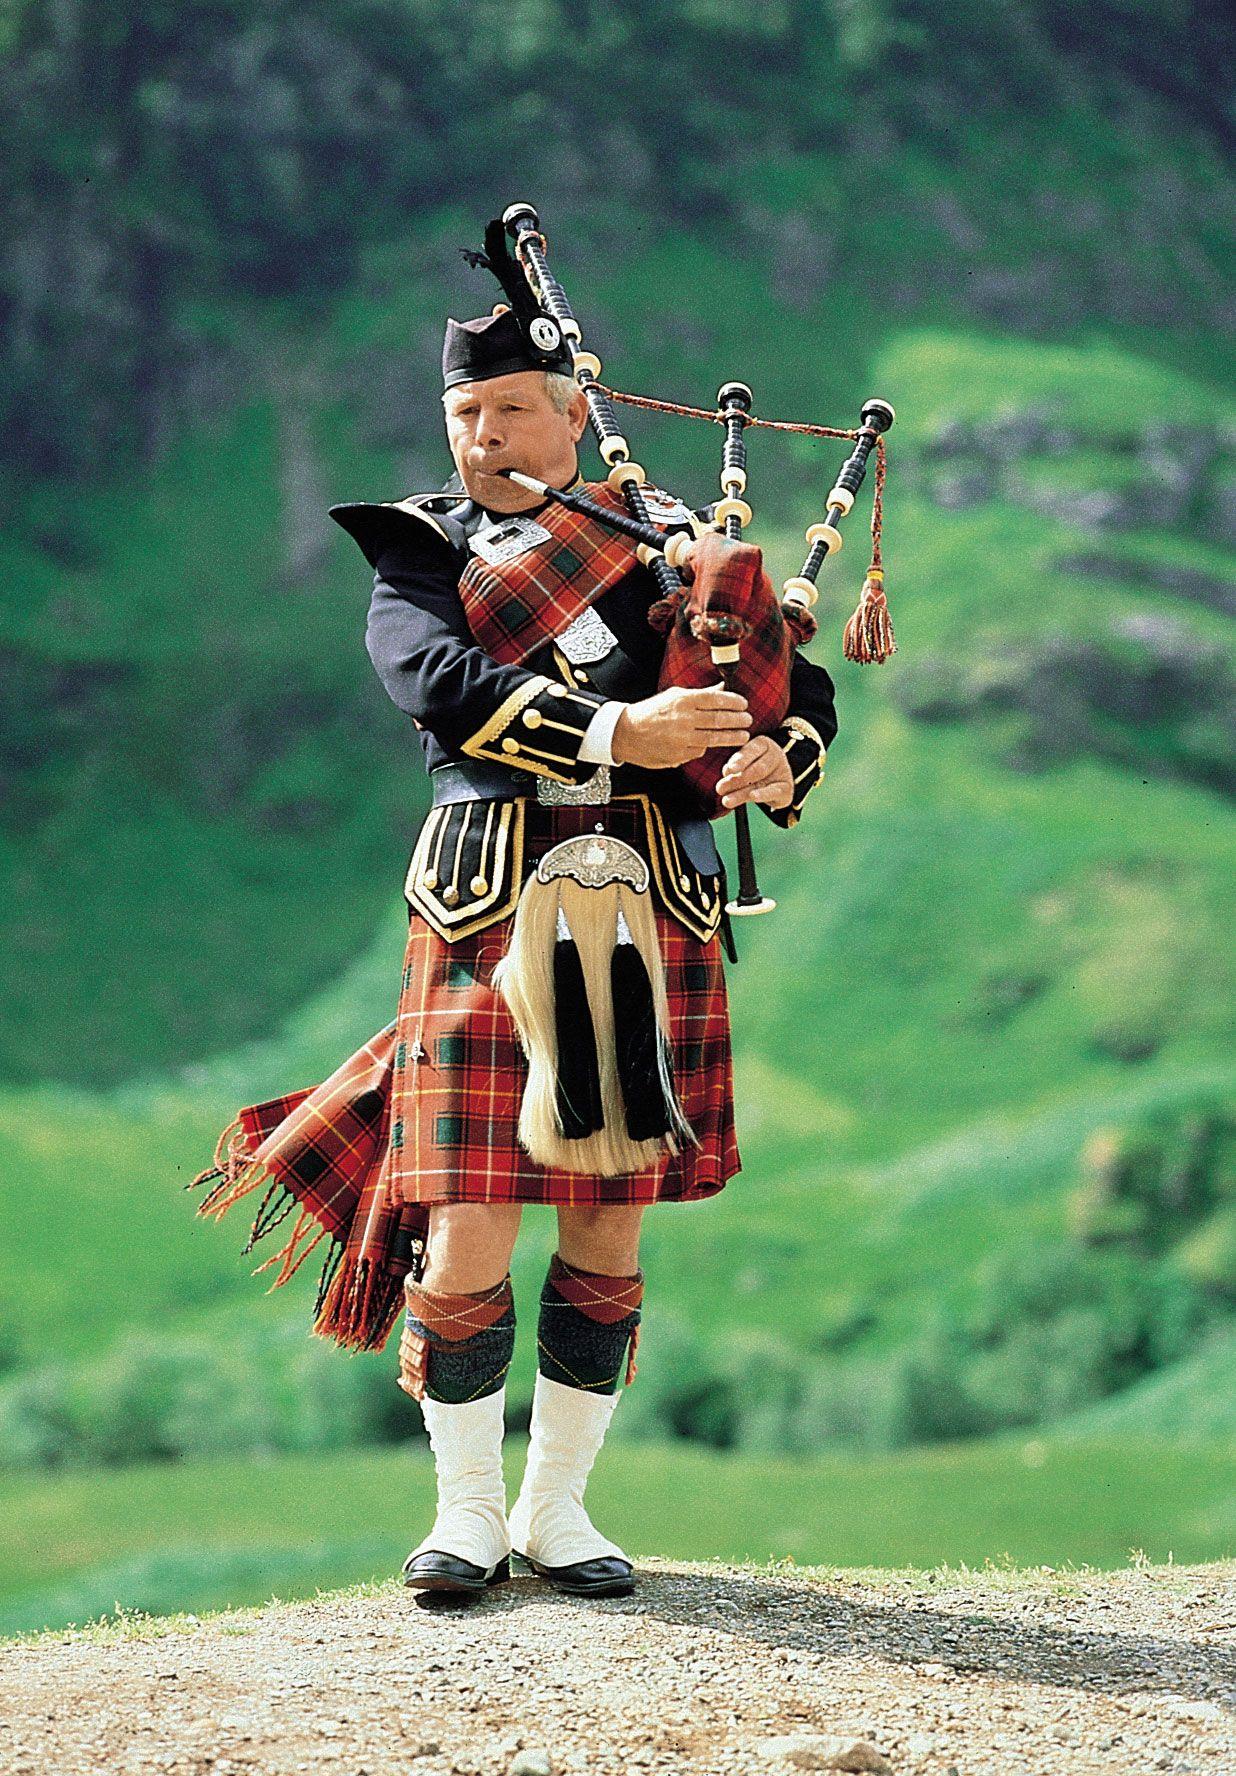 Scottish Wedding Music Ideas - 9 of Scotland s Favorite Tunes